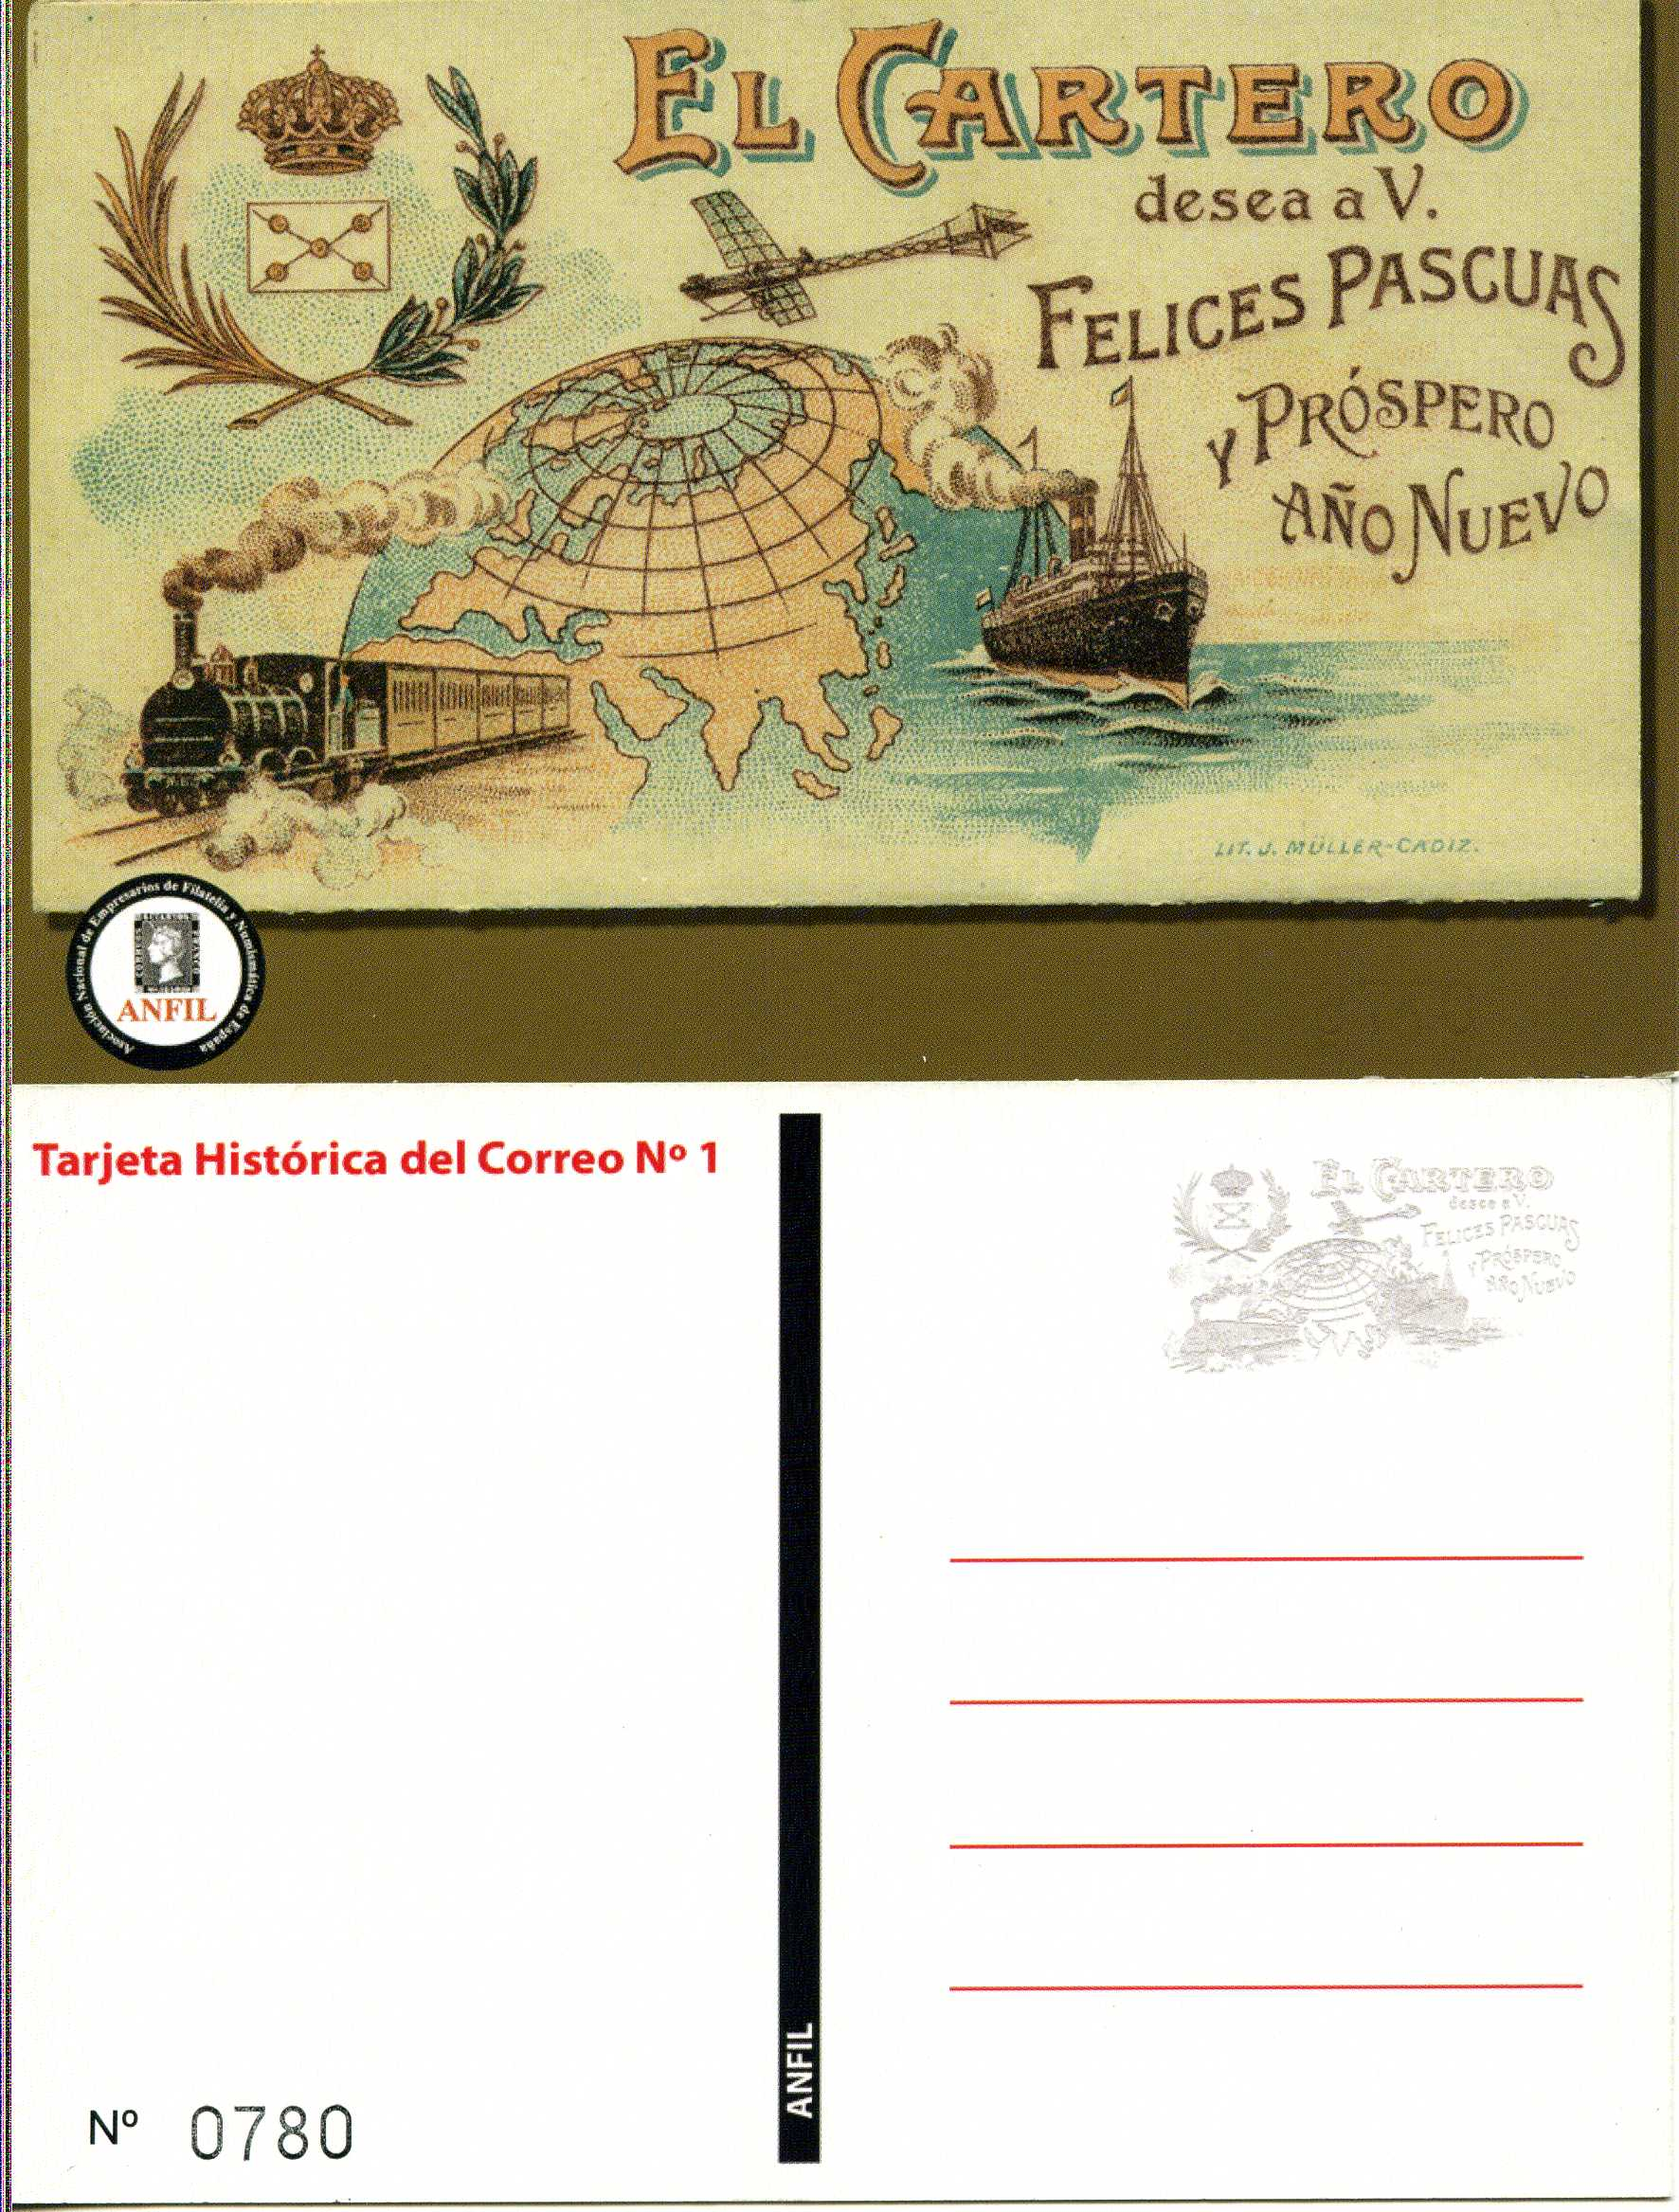 2012. Tarjeta Histórica del Correo